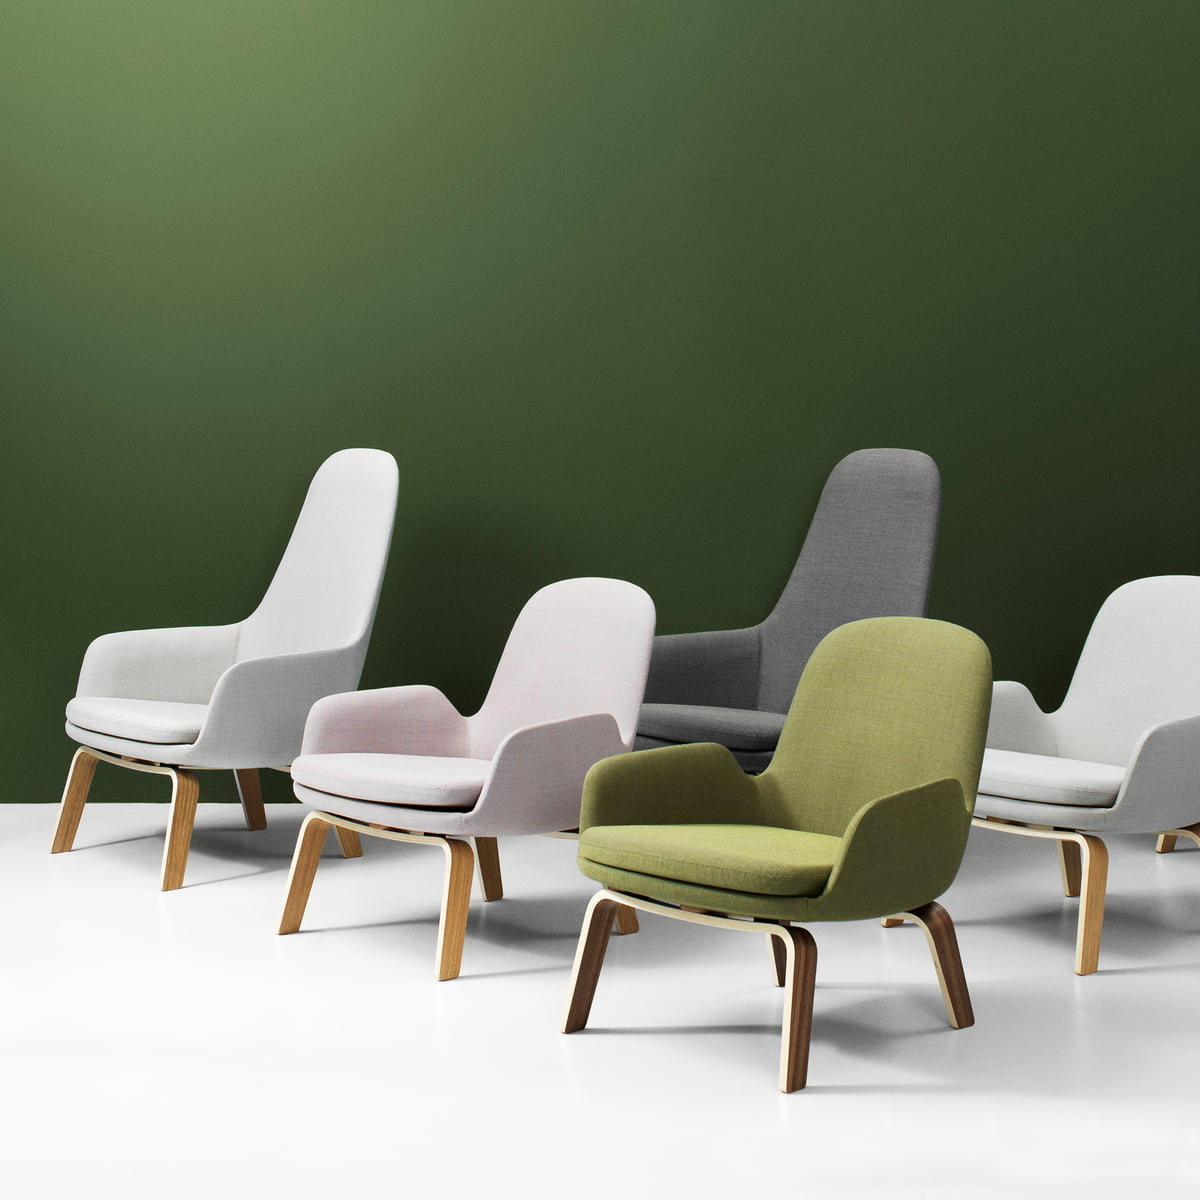 normann copenhagen  era lounge chairs. the era lounge chair from normann copenhagen